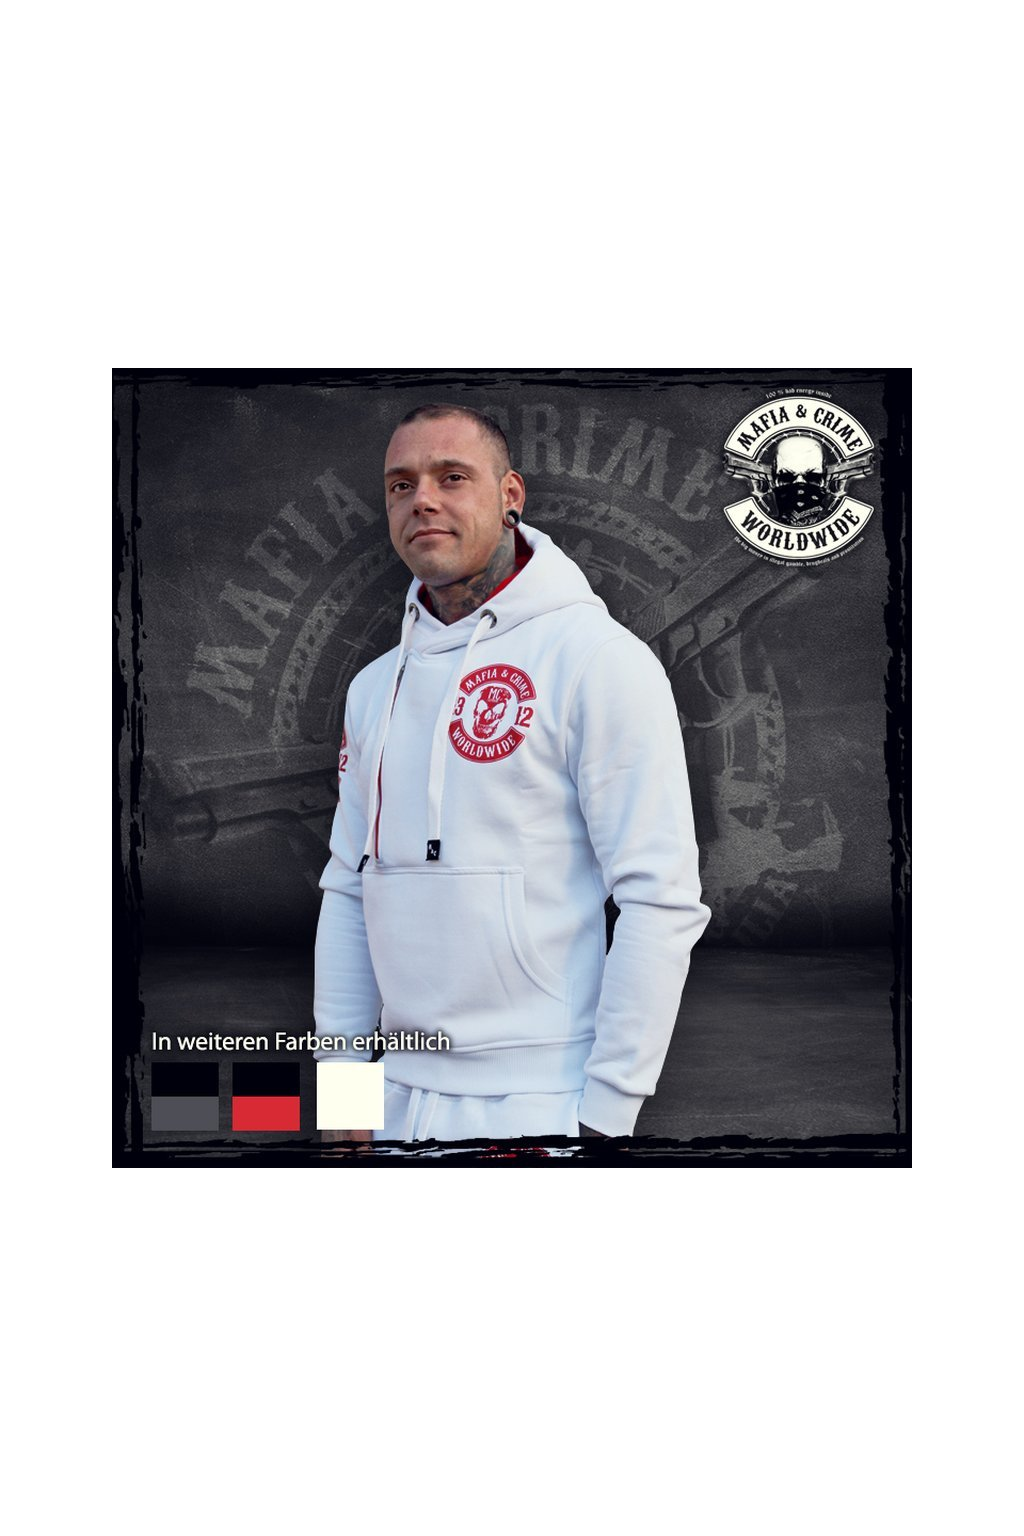 Pánská mikina Mafia & Crime 1312 Patch Hoodie bílá obr1